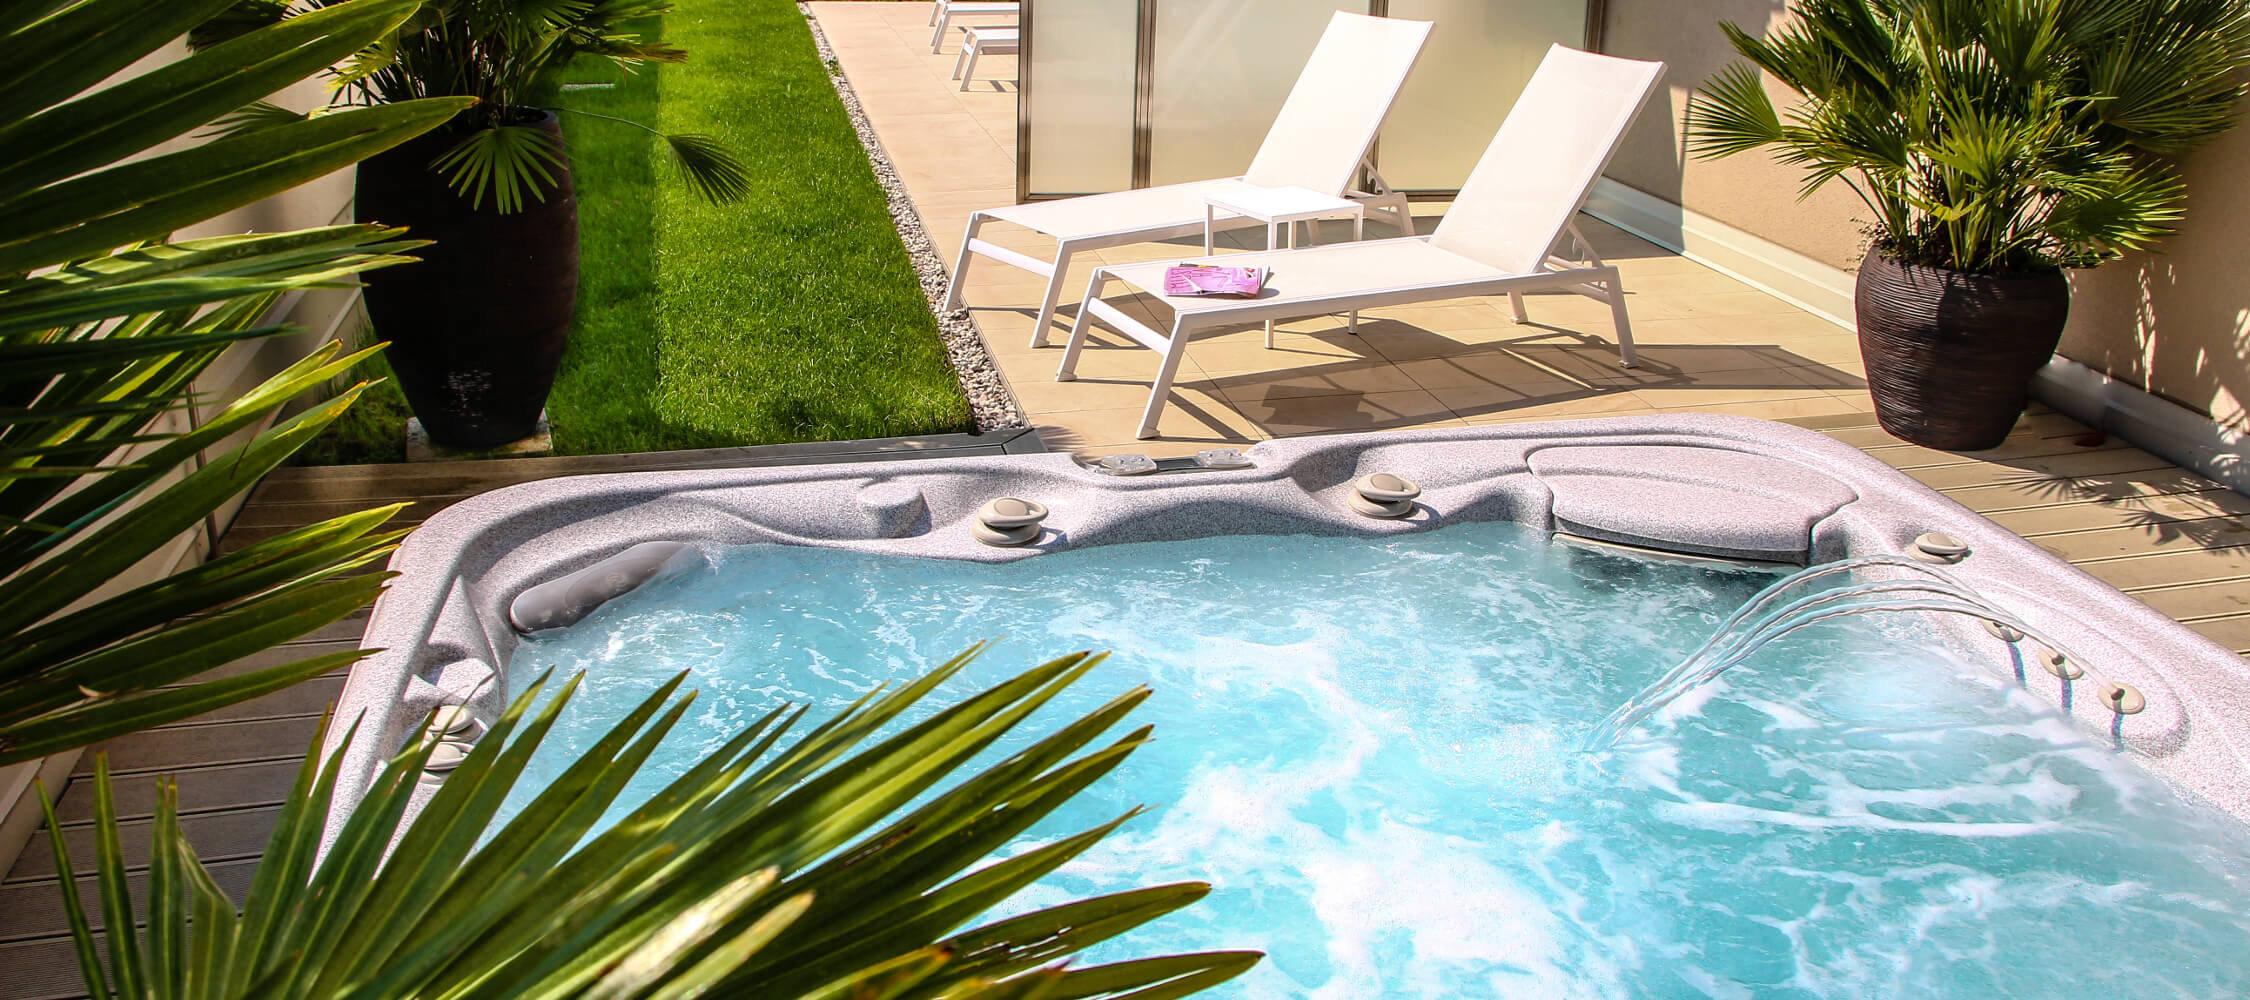 City_Hotel_Merano_Spa_Terrasse_Jacuzzi_Whirlpool_Anguane_2053_2250x1000